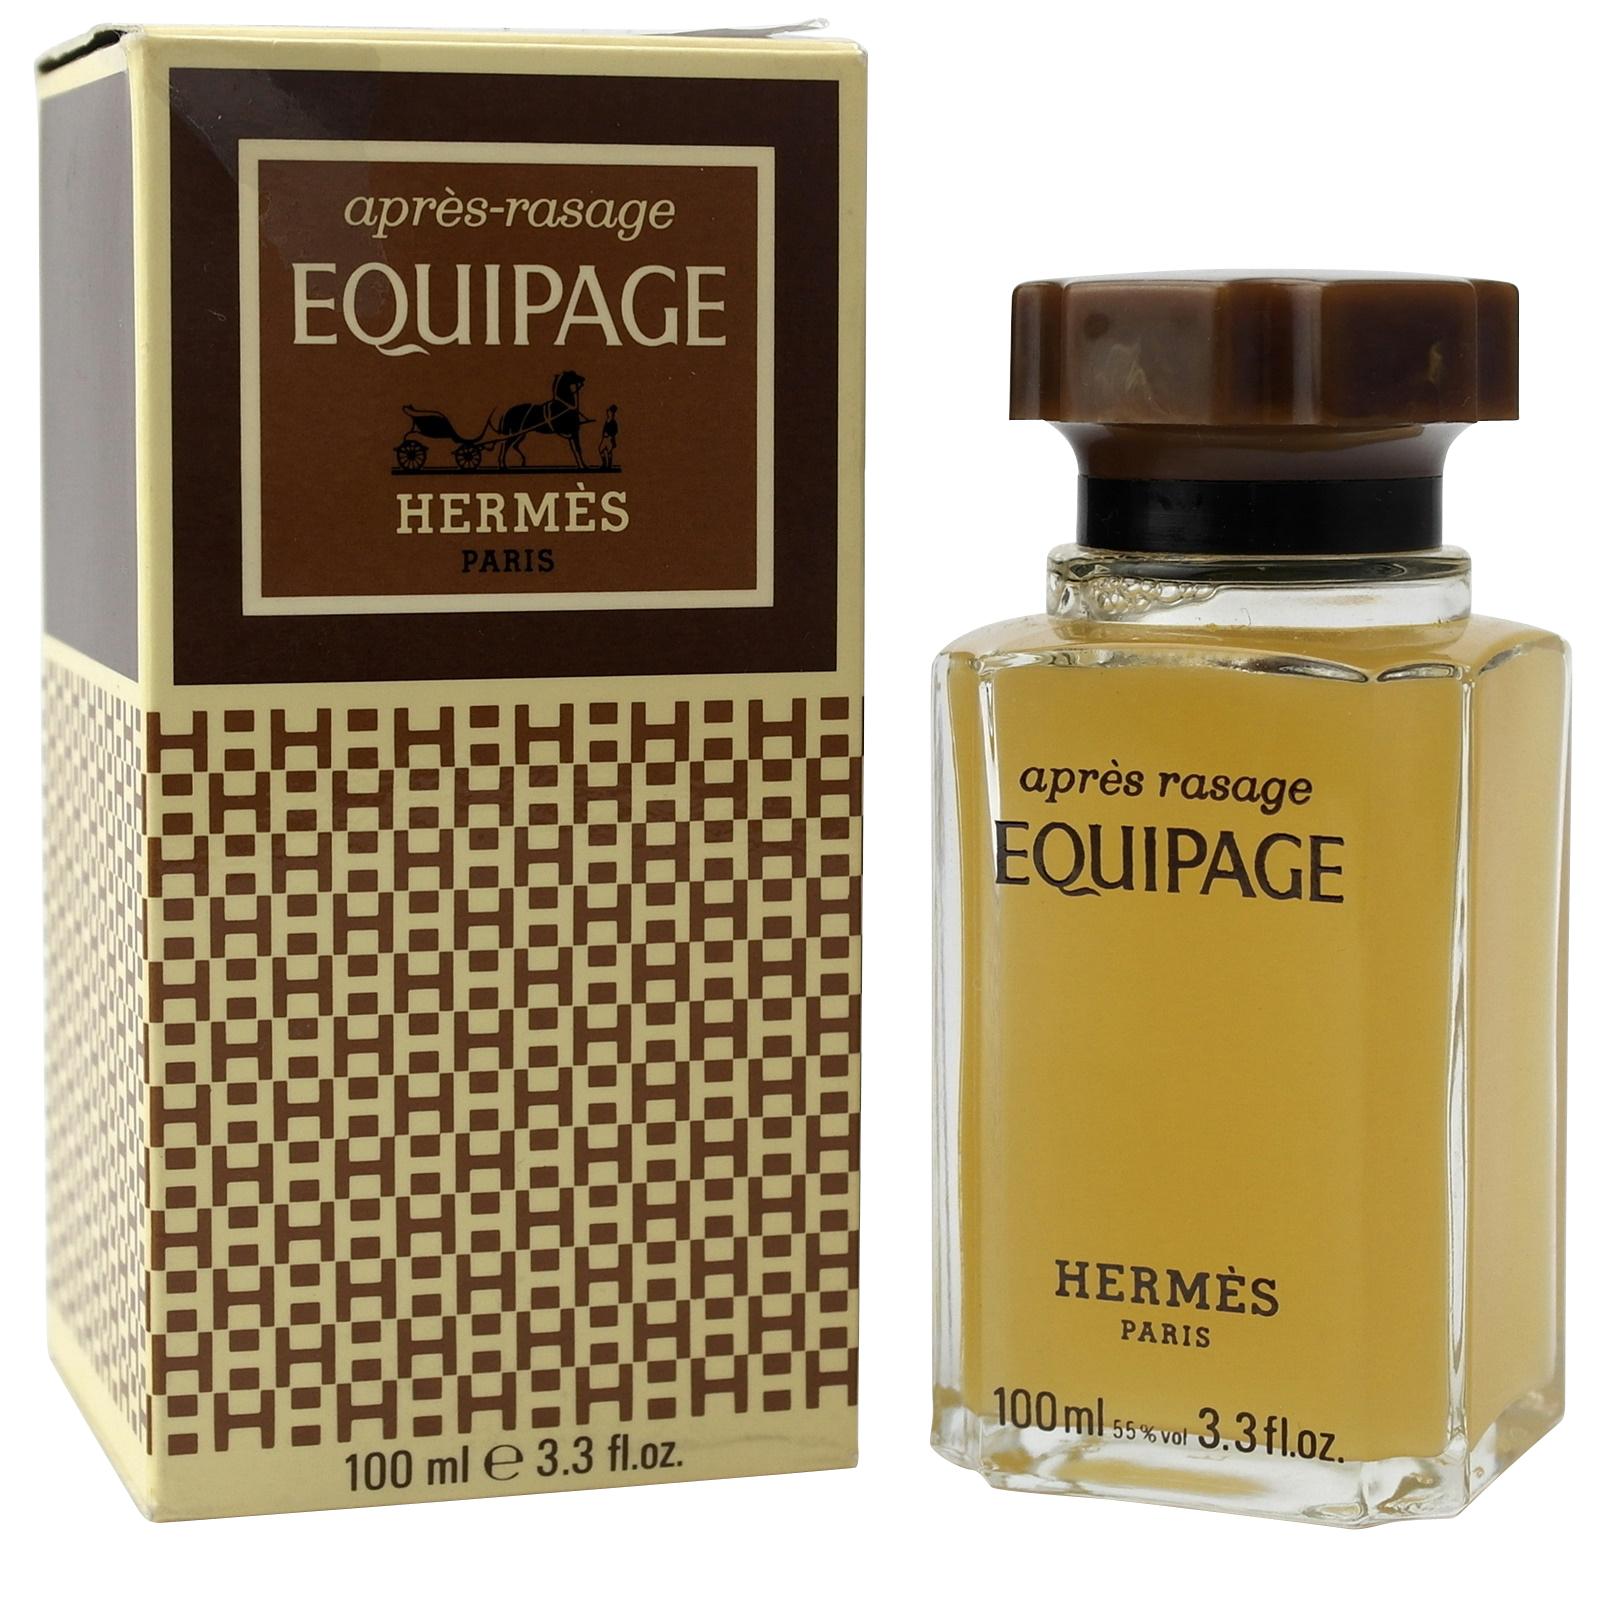 After 100 Shave Hermes Equipage Q4ajl3sc5r Ml QdxrCtsohB